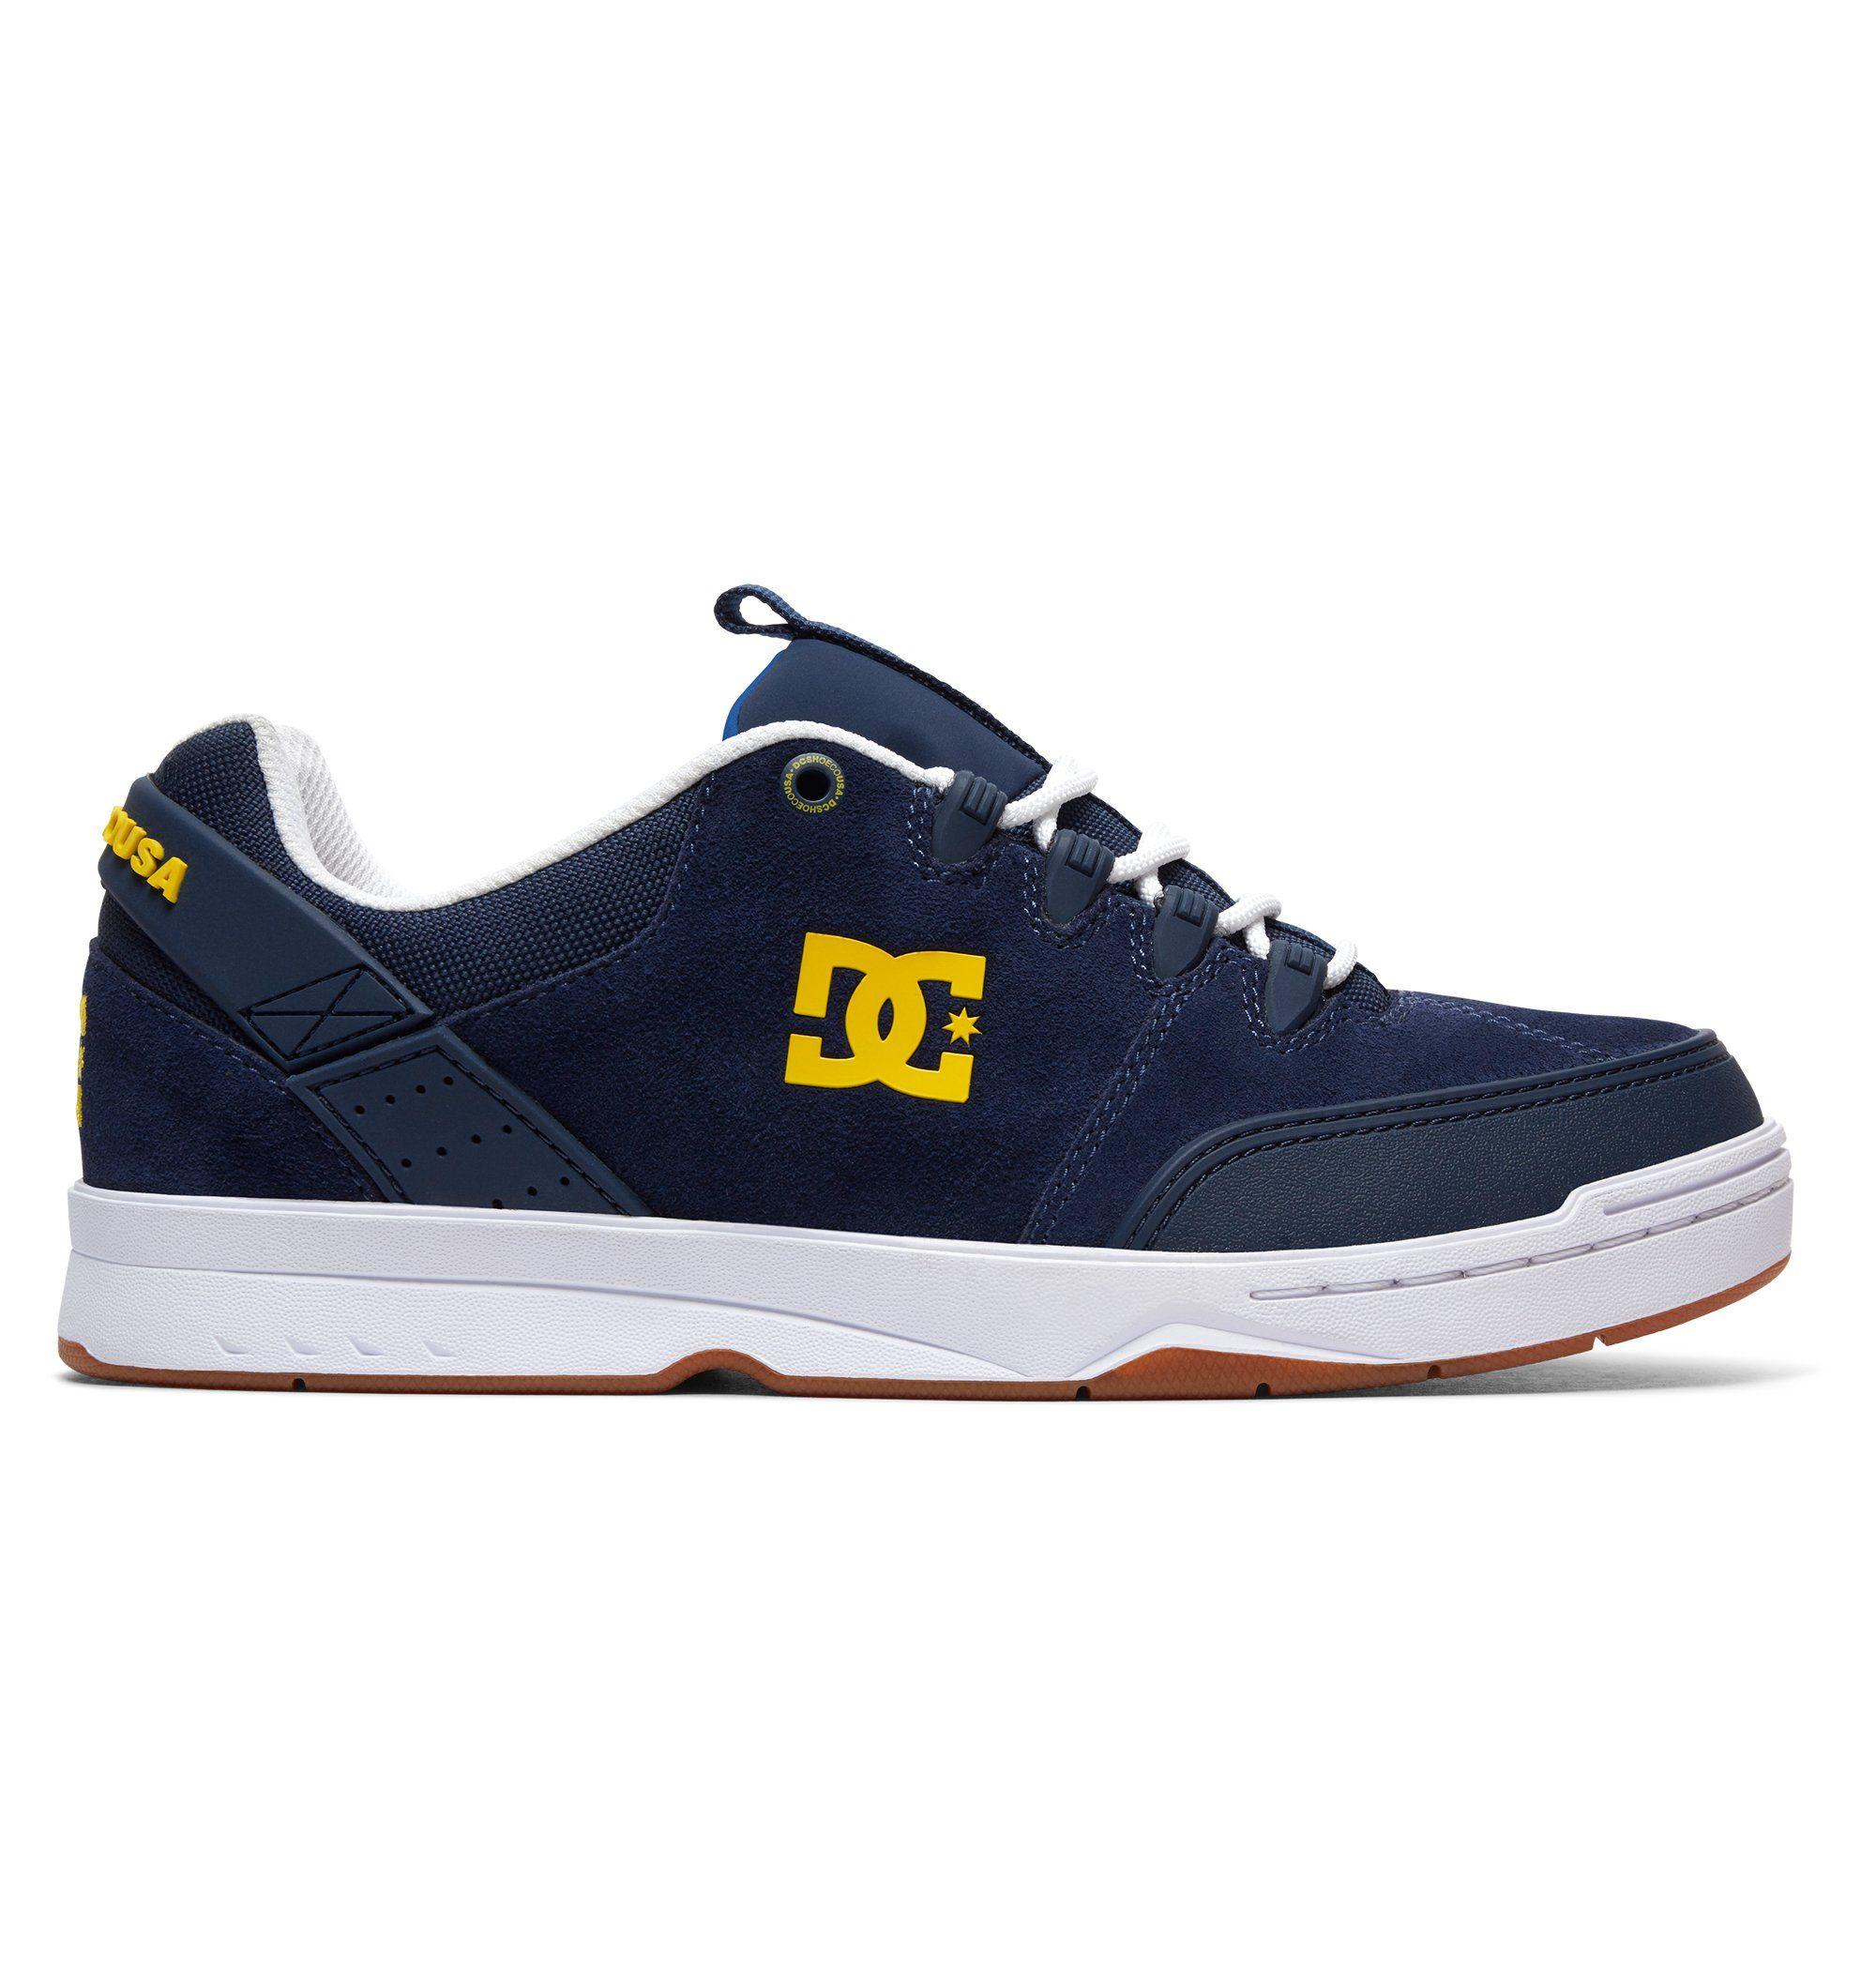 DC Shoes Schuhe Syntax online kaufen  Navy#ft5_slash#white